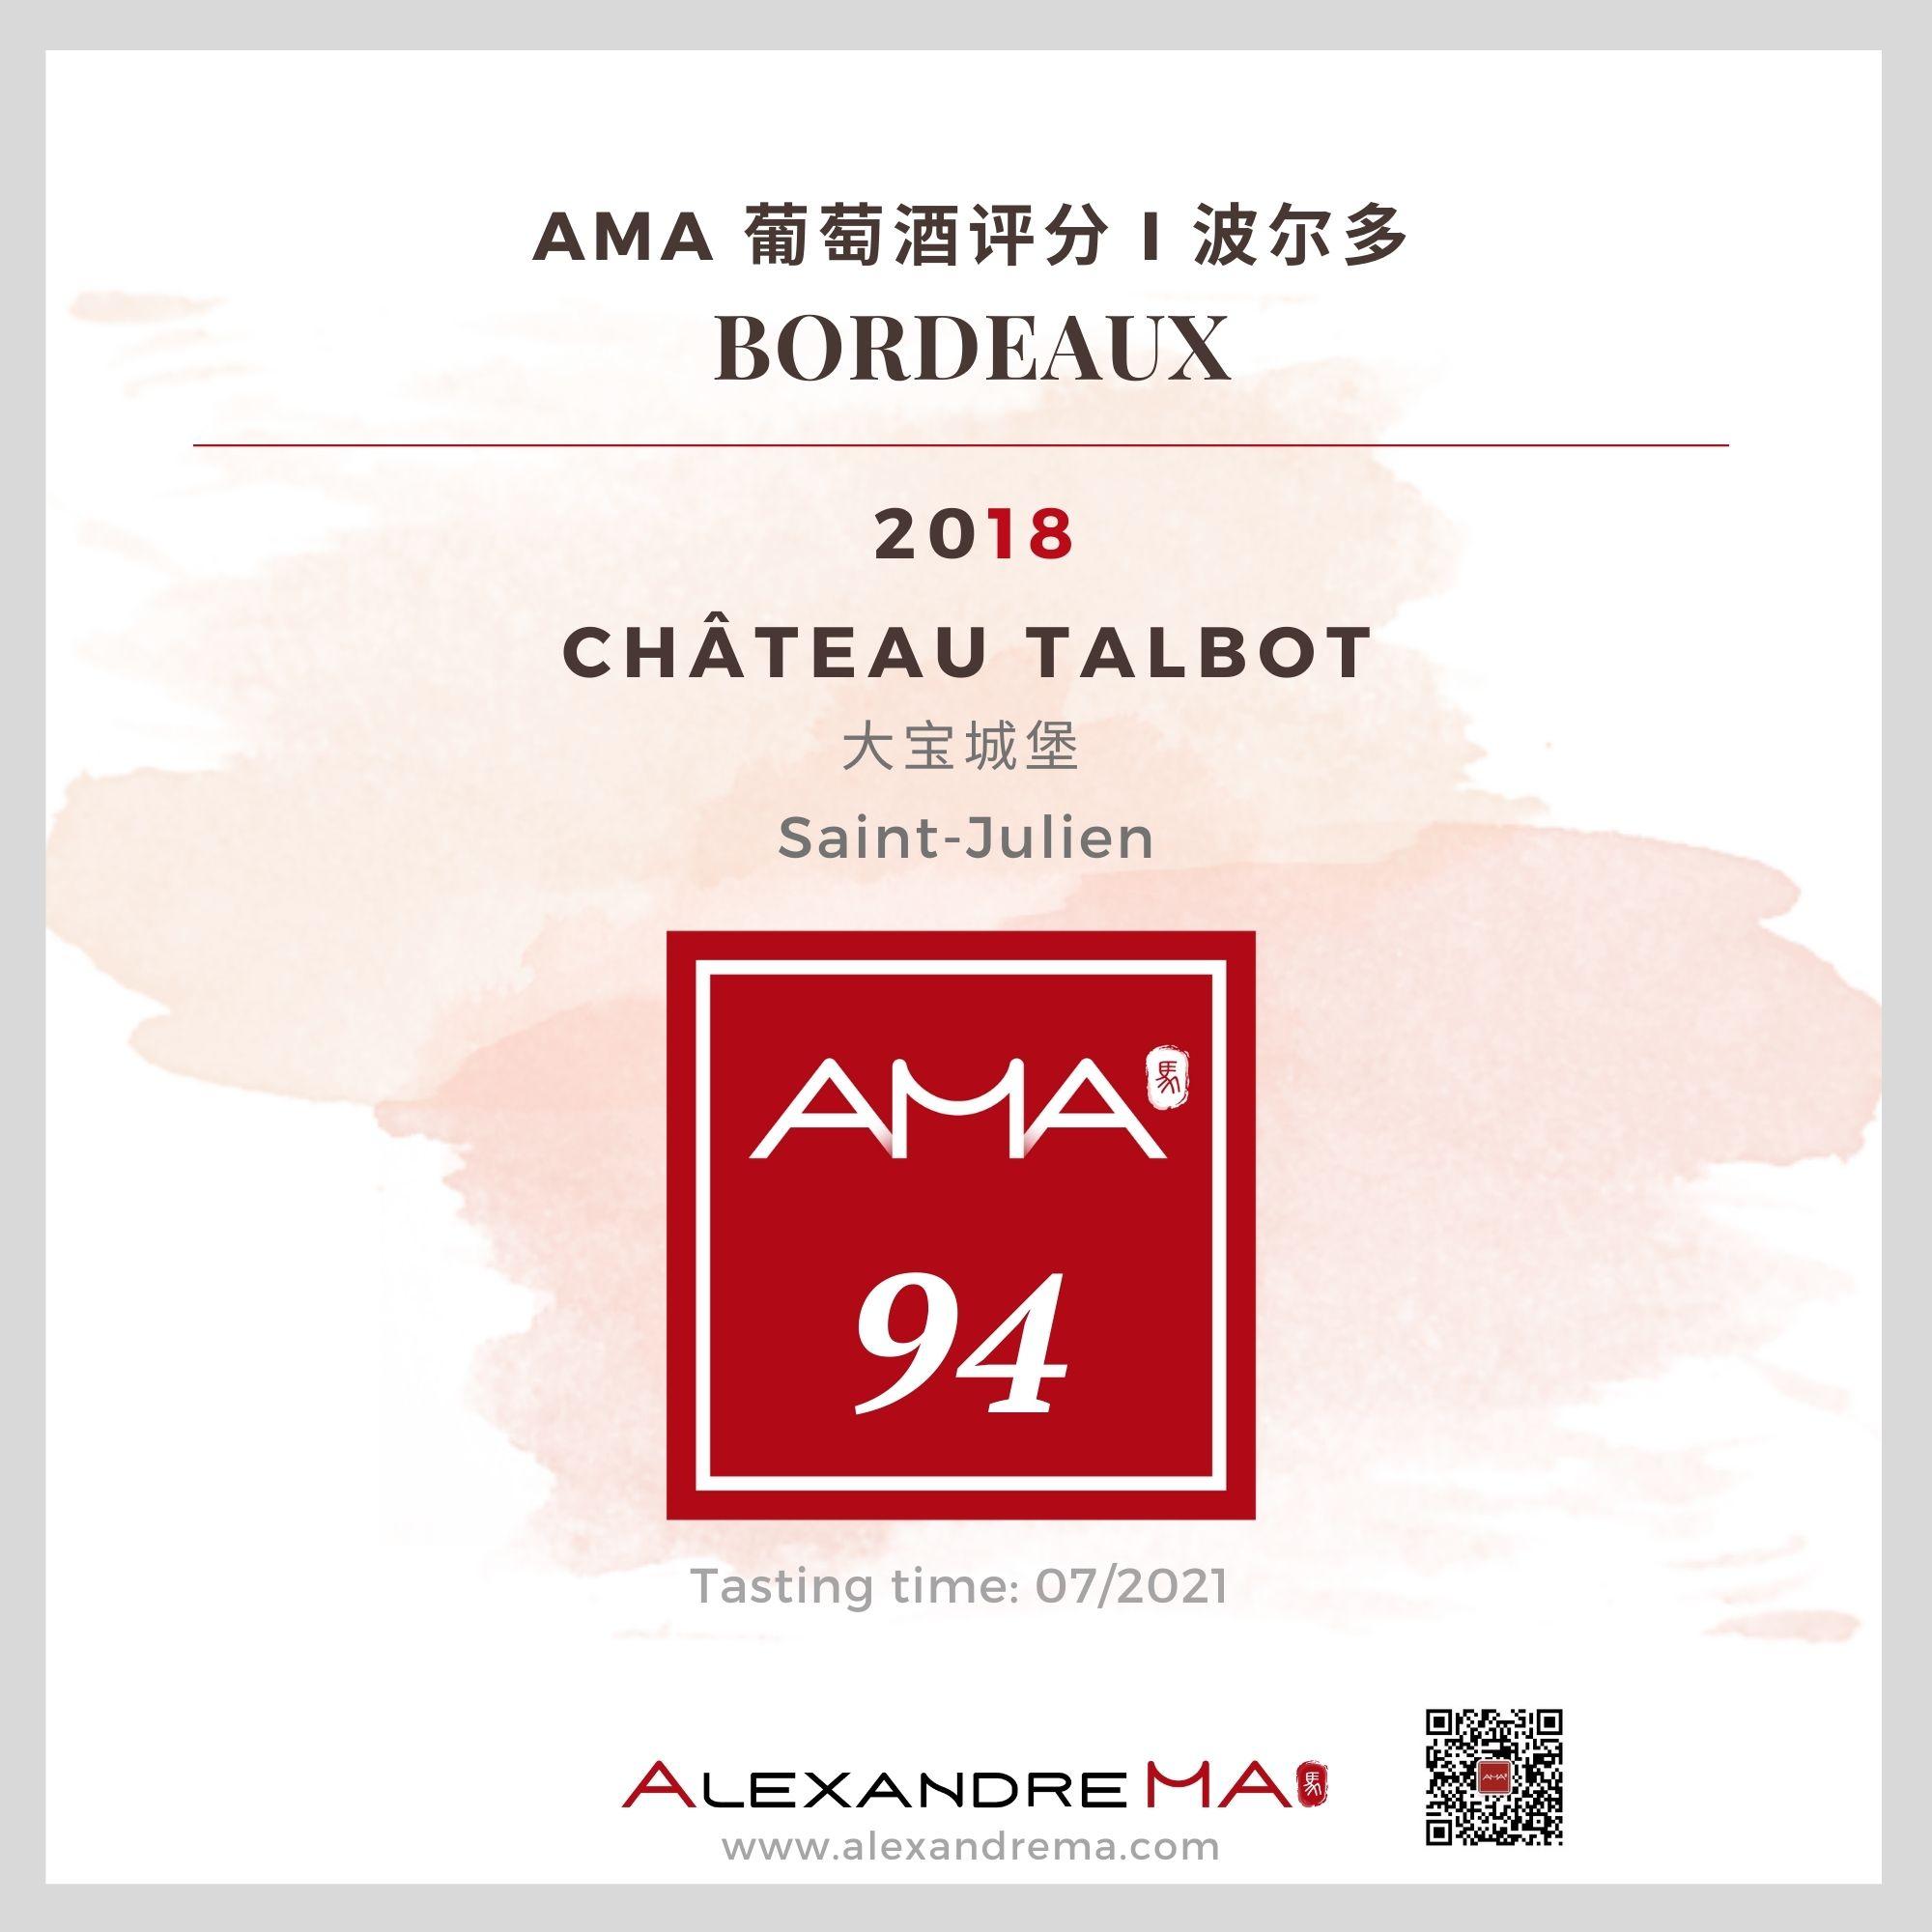 Château Talbot 2018 大宝城堡 - Alexandre Ma